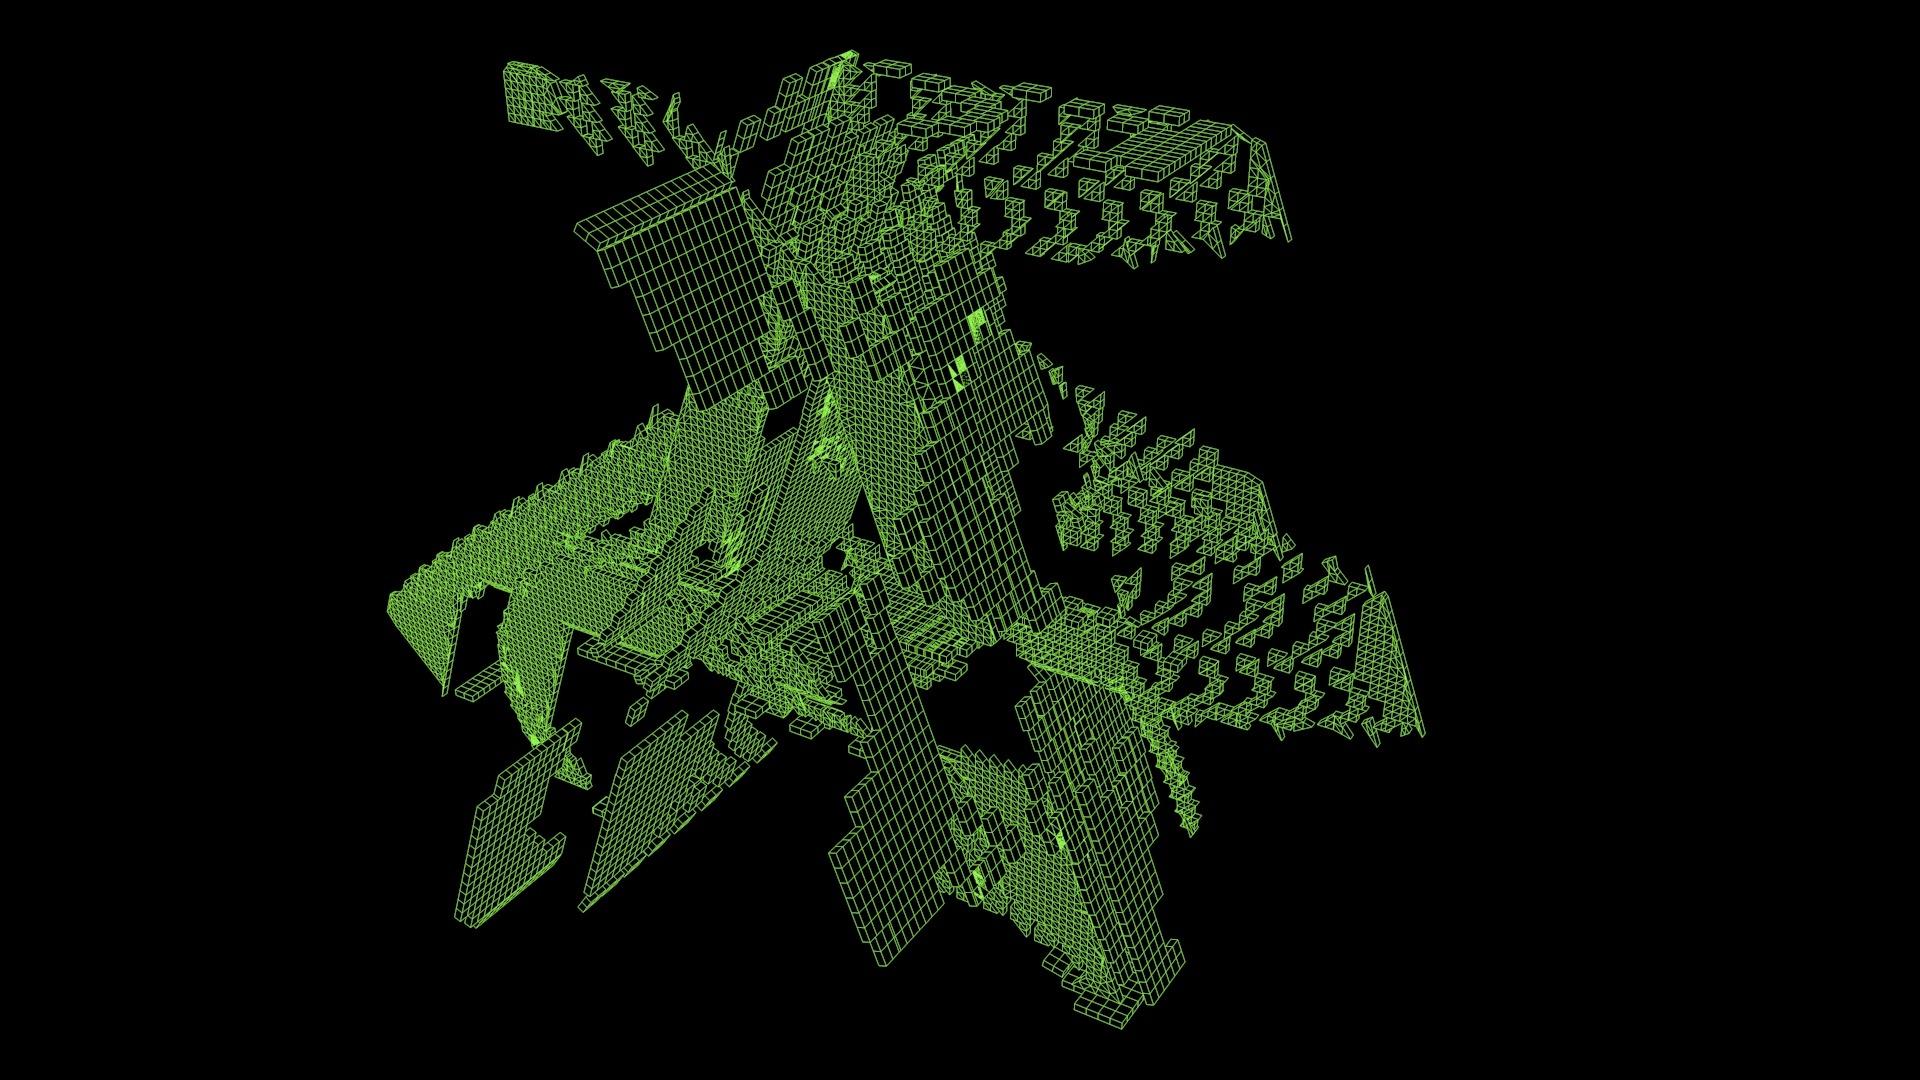 green cgi structure black background